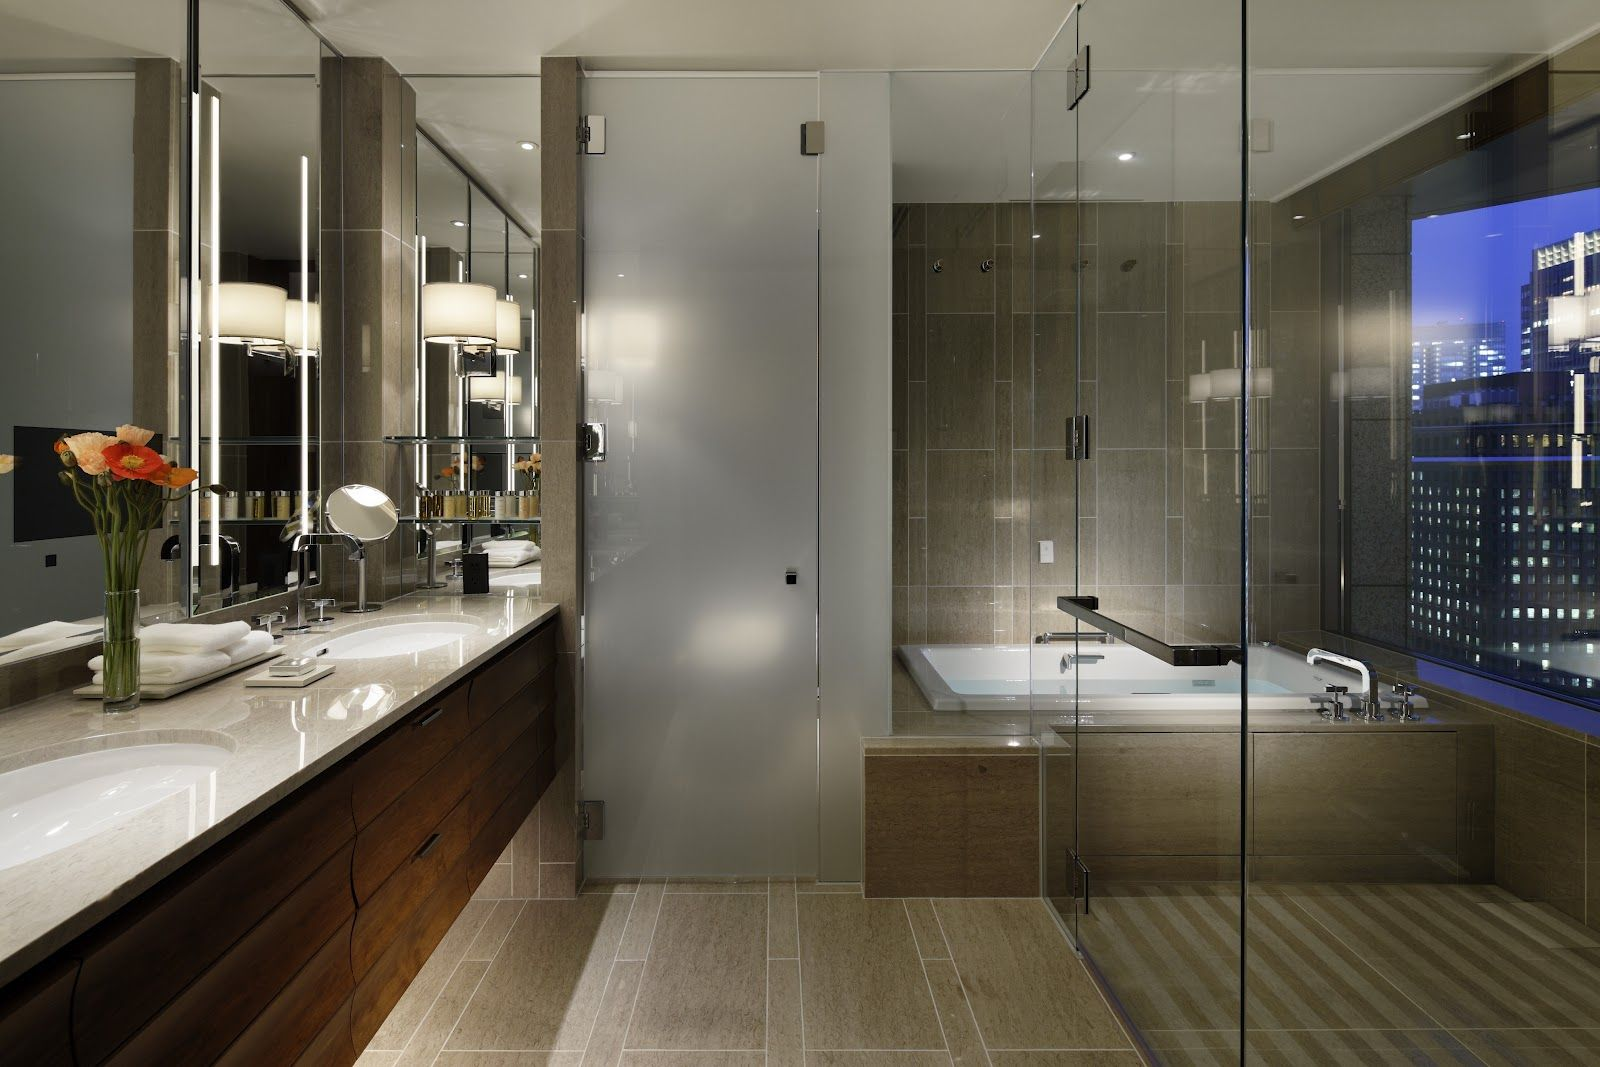 Palace Hotel Tokyo Hotel Bathroom Design Luxury Hotel Bathroom Palace Hotel